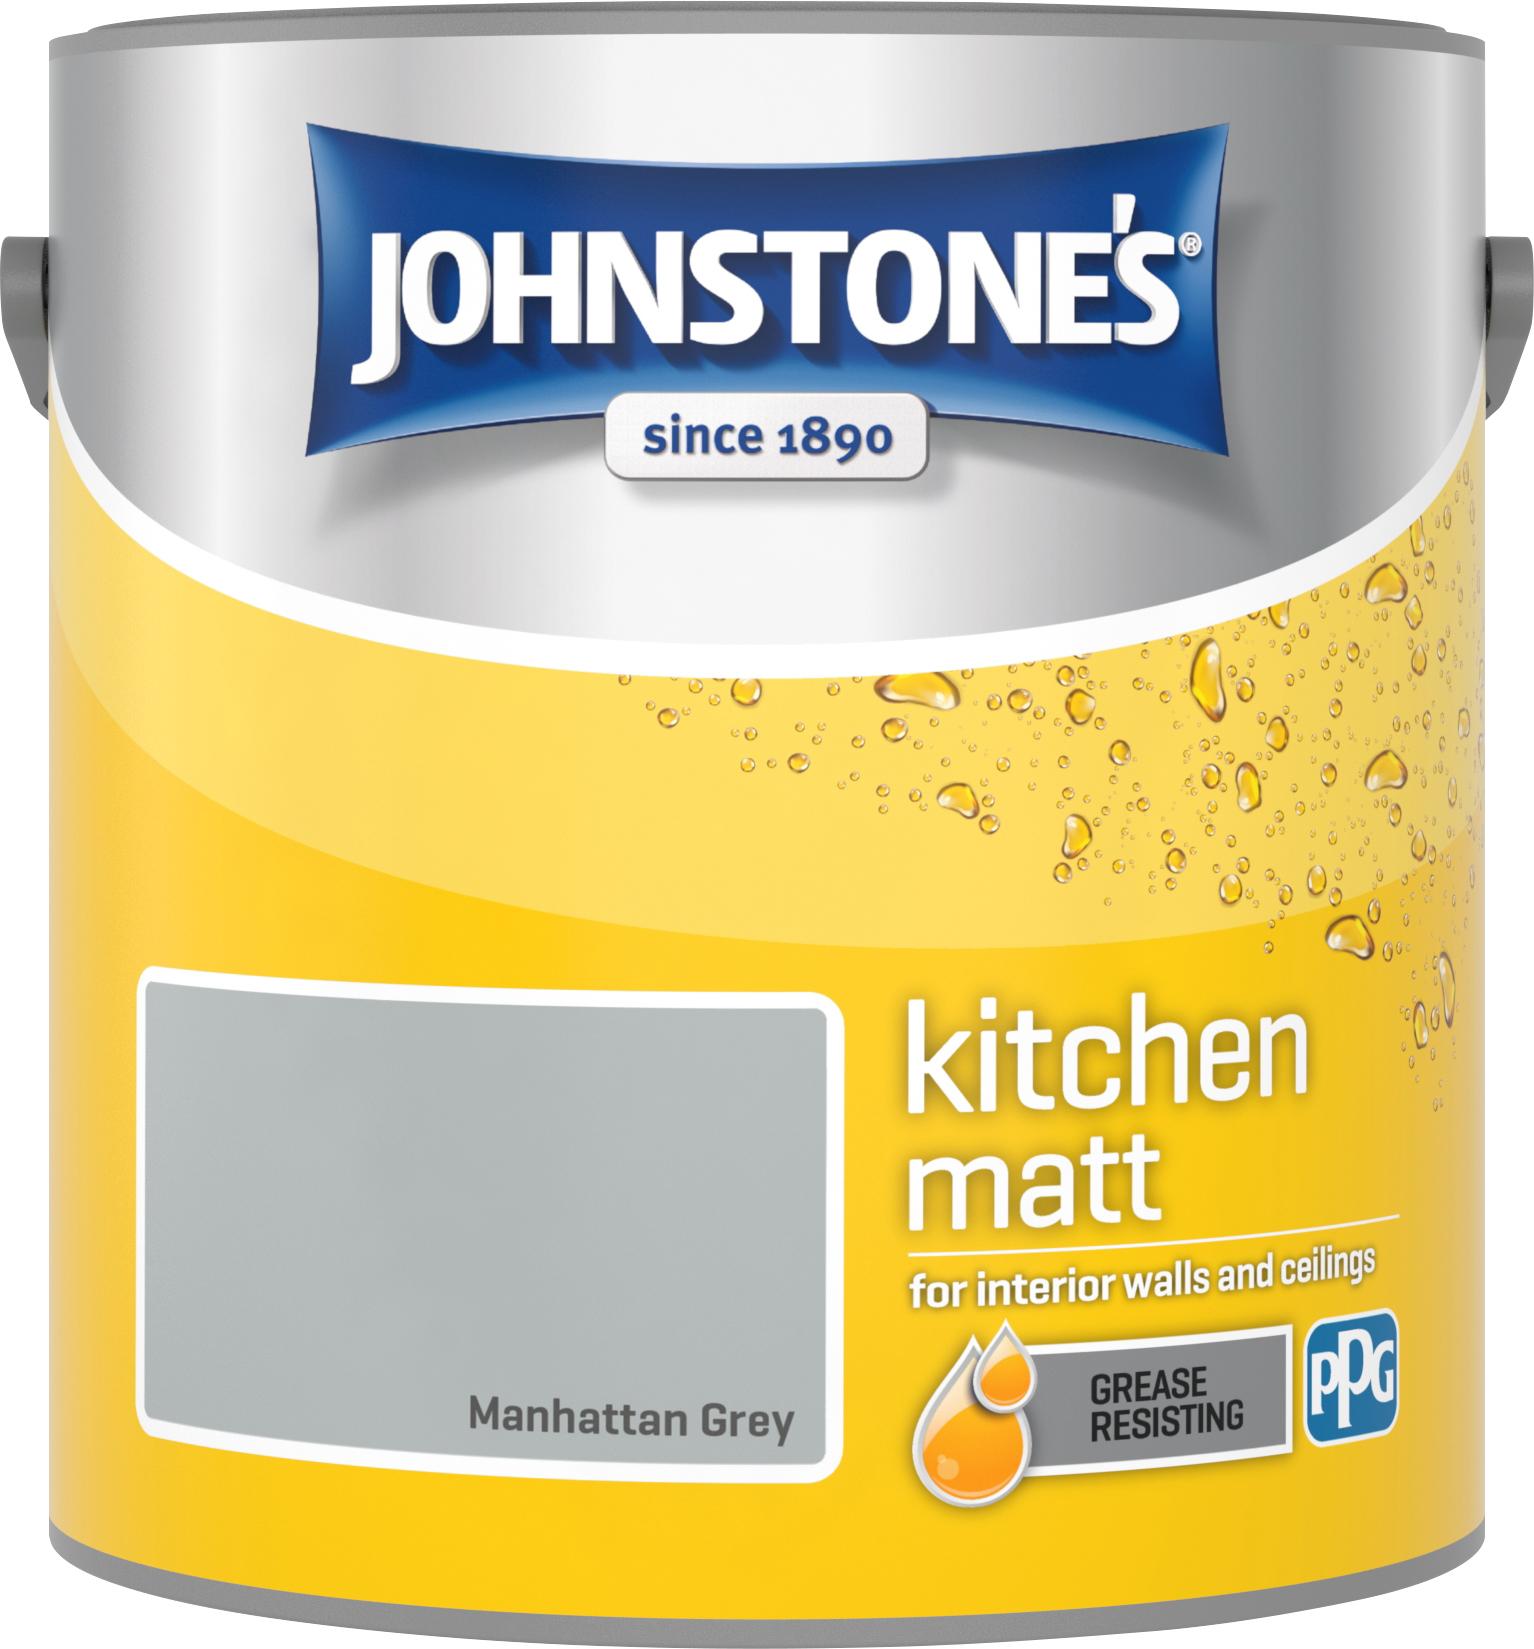 Johnstone's 2.5 Litre Kitchen Paint - Manhattan Grey